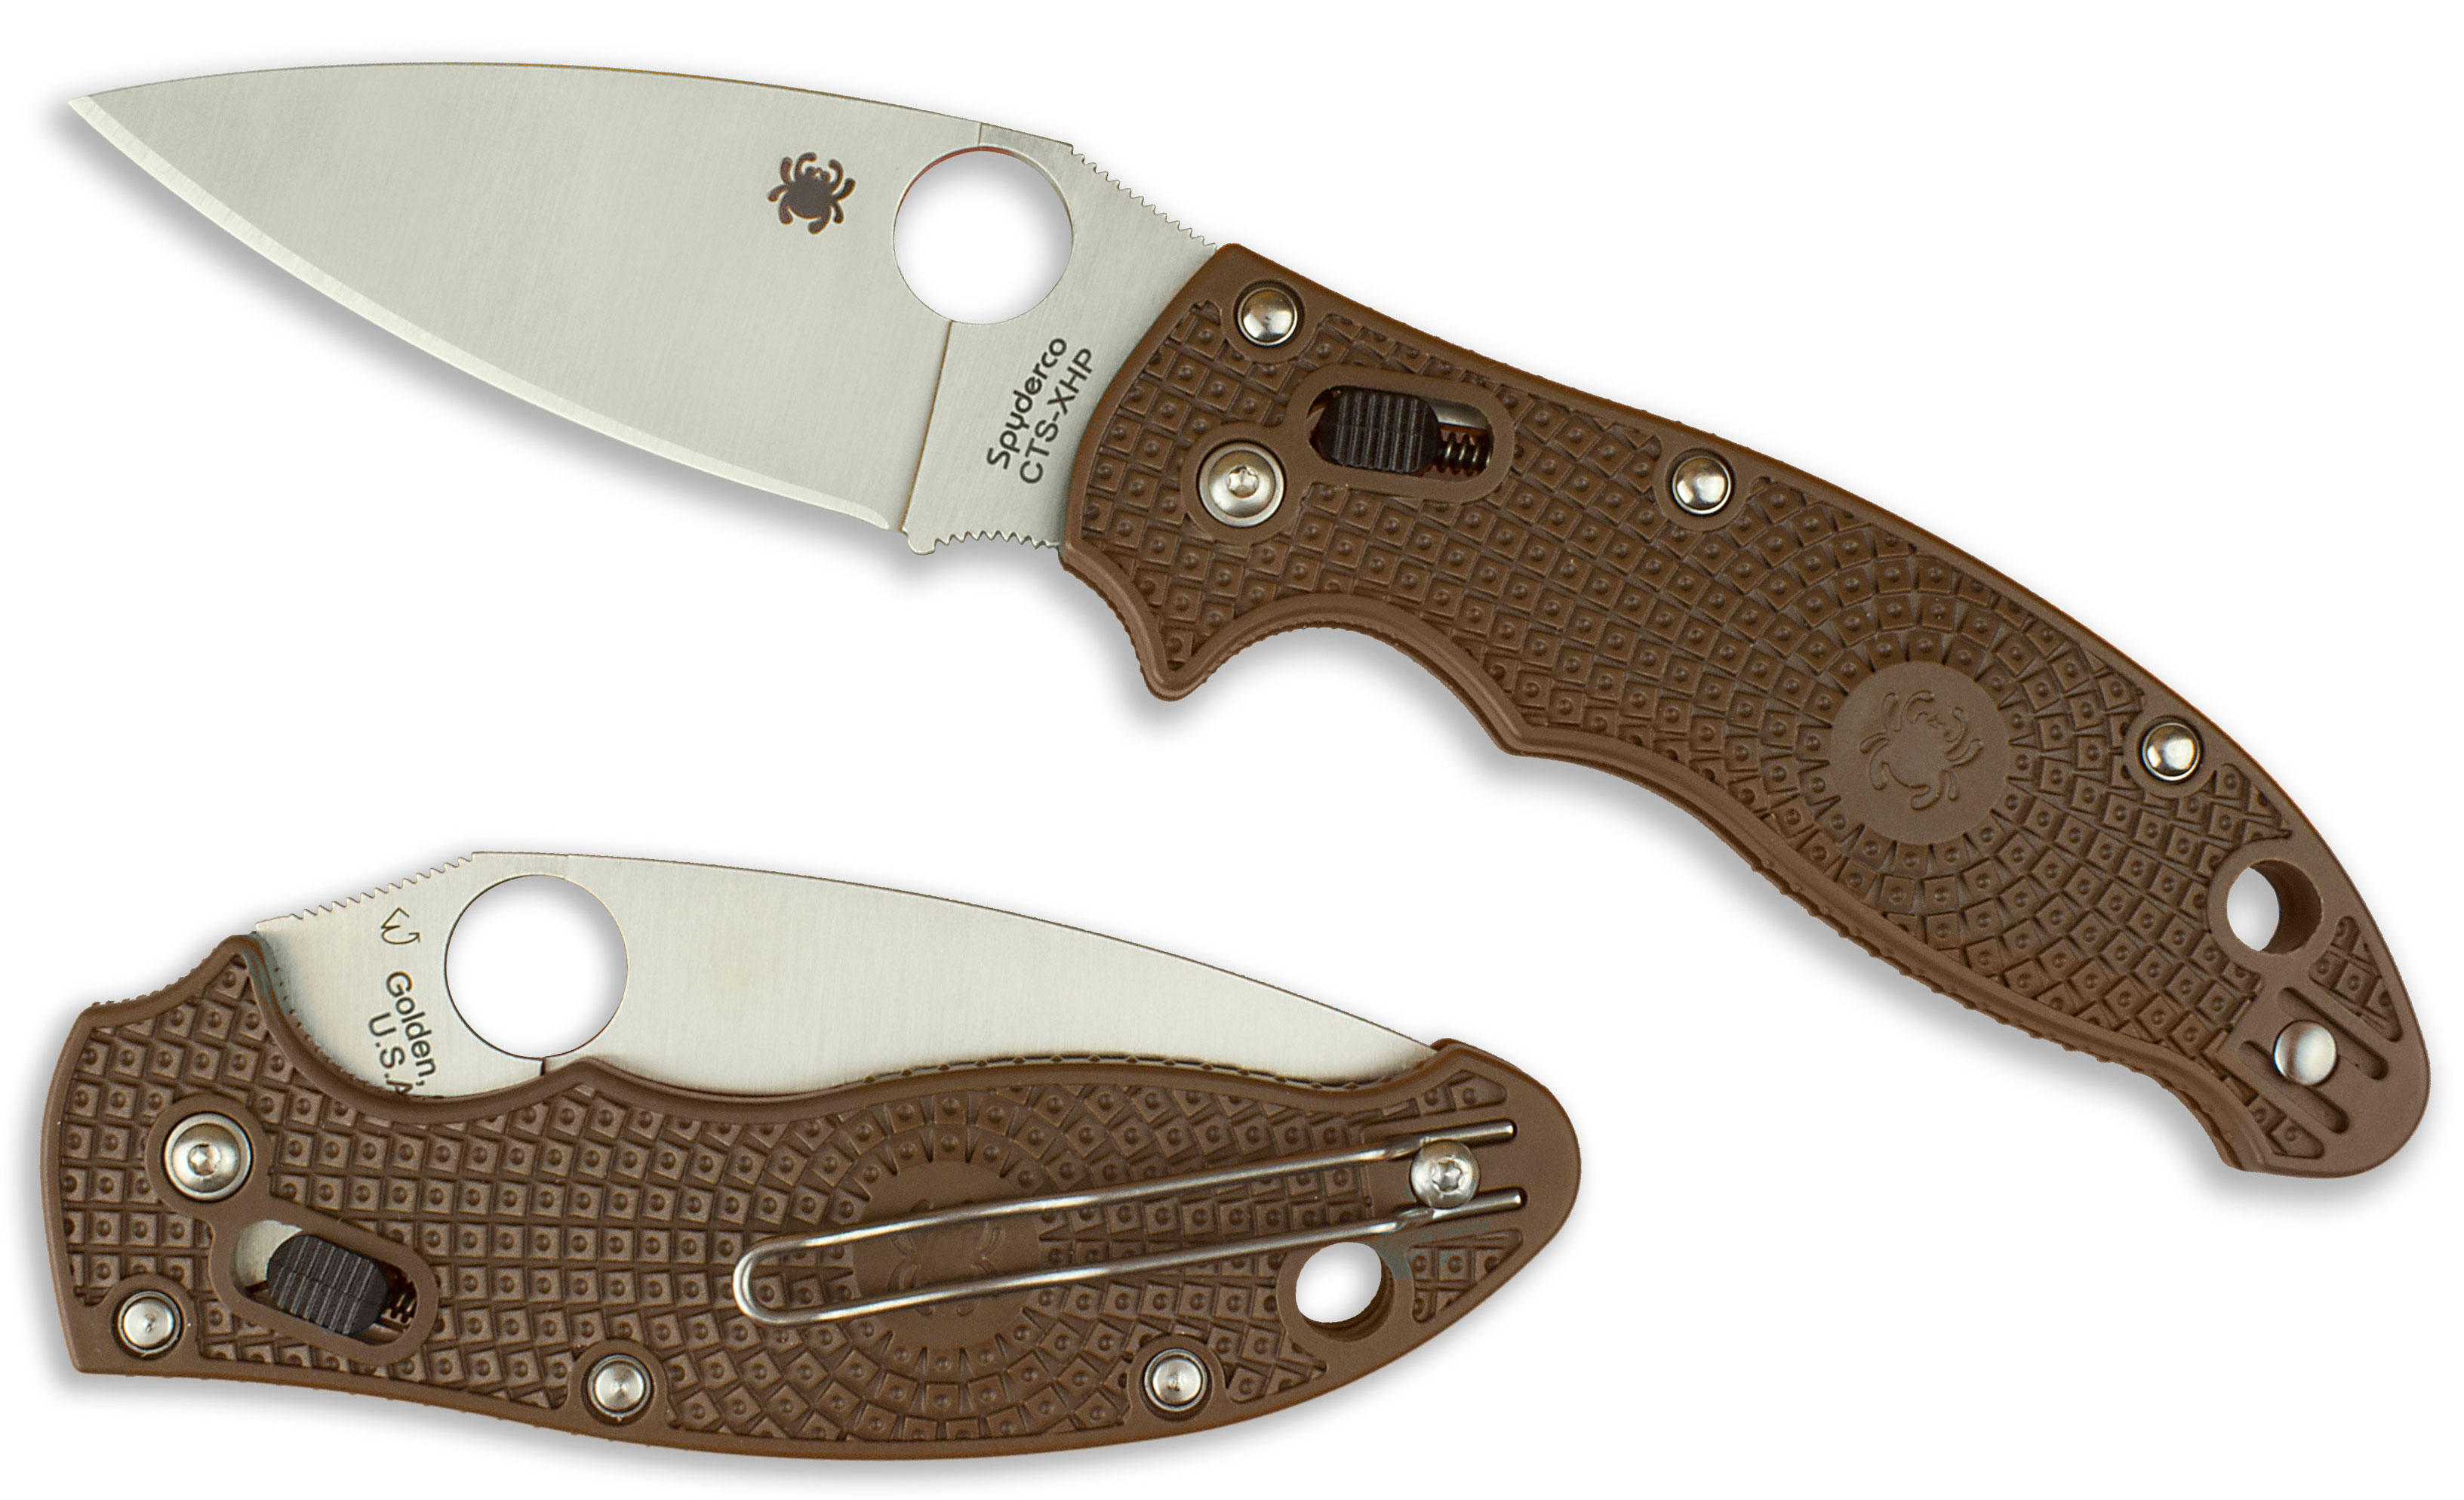 Spyderco C101PBN2 Manix 2 Lightweight Folding Knife 3.37 inch Satin Plain CTS-XHP Blade, Brown FRN Handles - KnifeCenter Exclusive